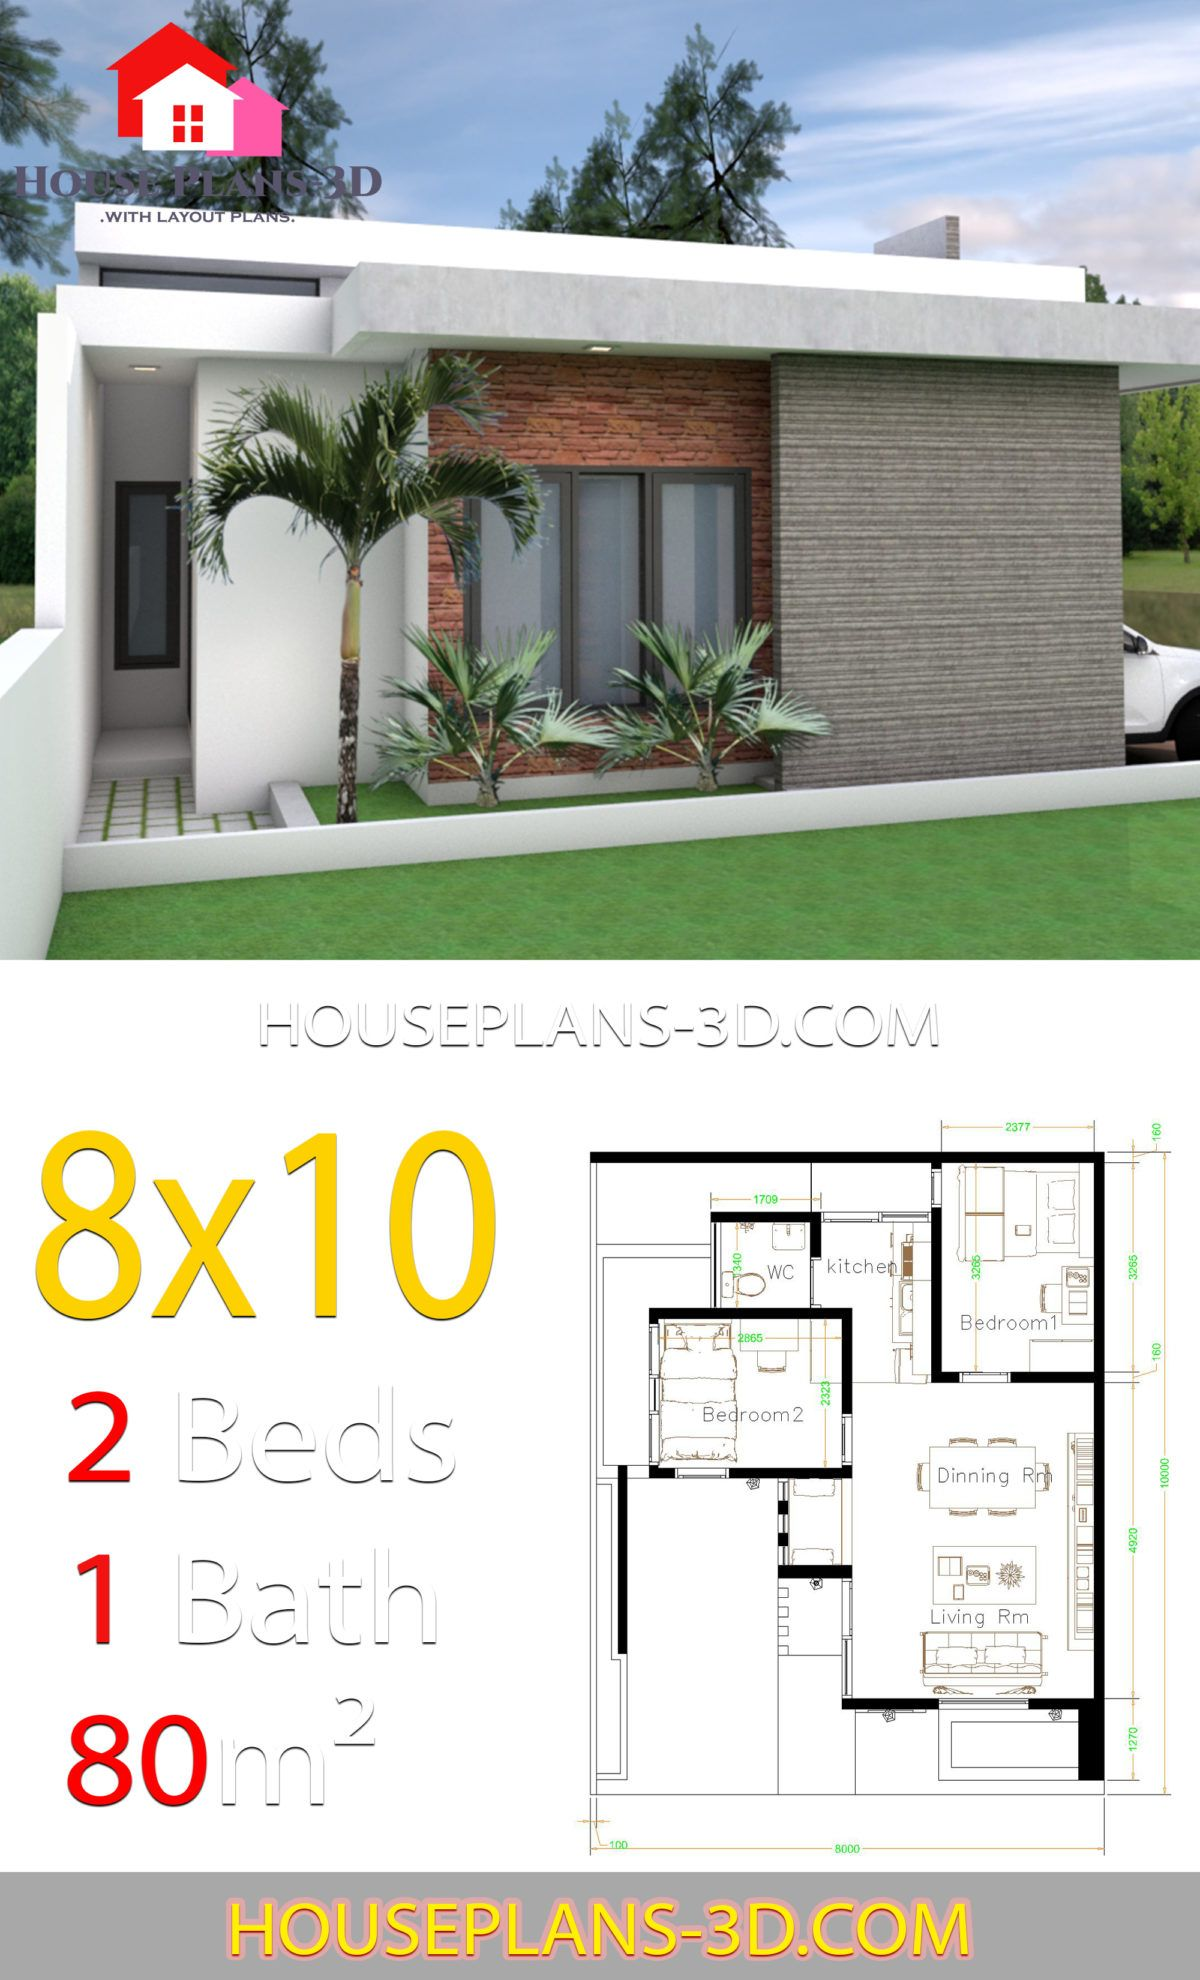 House Design 8x10 With 2 Bedrooms Terrace Roof House Plans 3d Architectural House Plans House Construction Plan House Plans